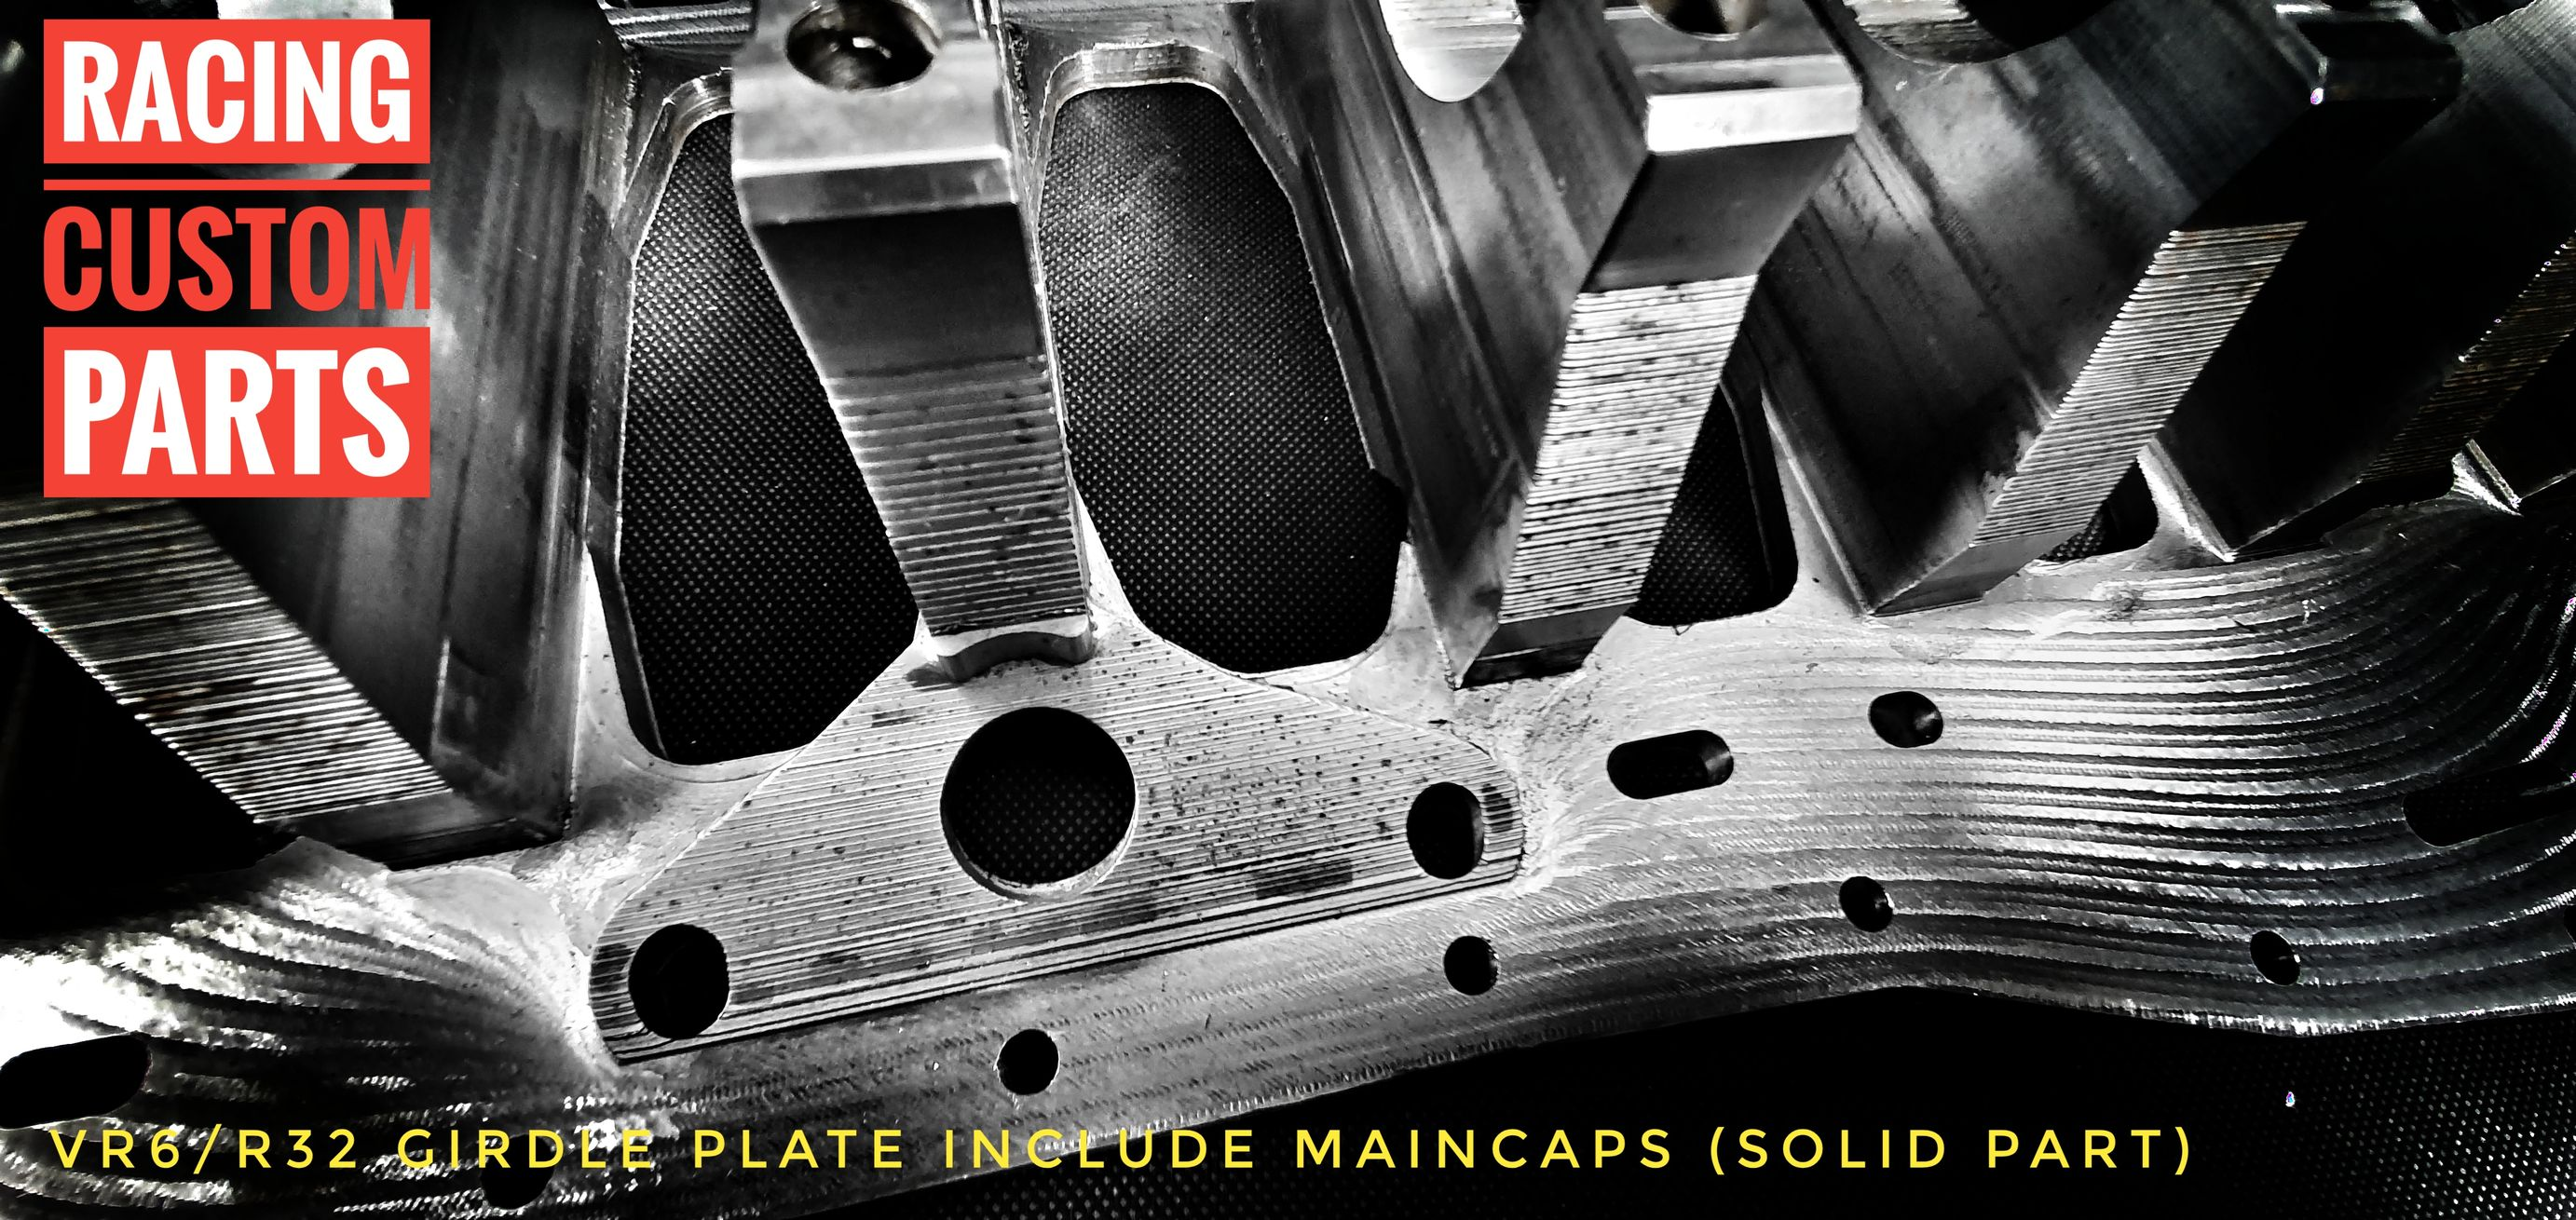 VR6 R32 Audi vw solid girdle plate maincaps 1000+ horse power girdle plate racing custom parts billet cnc